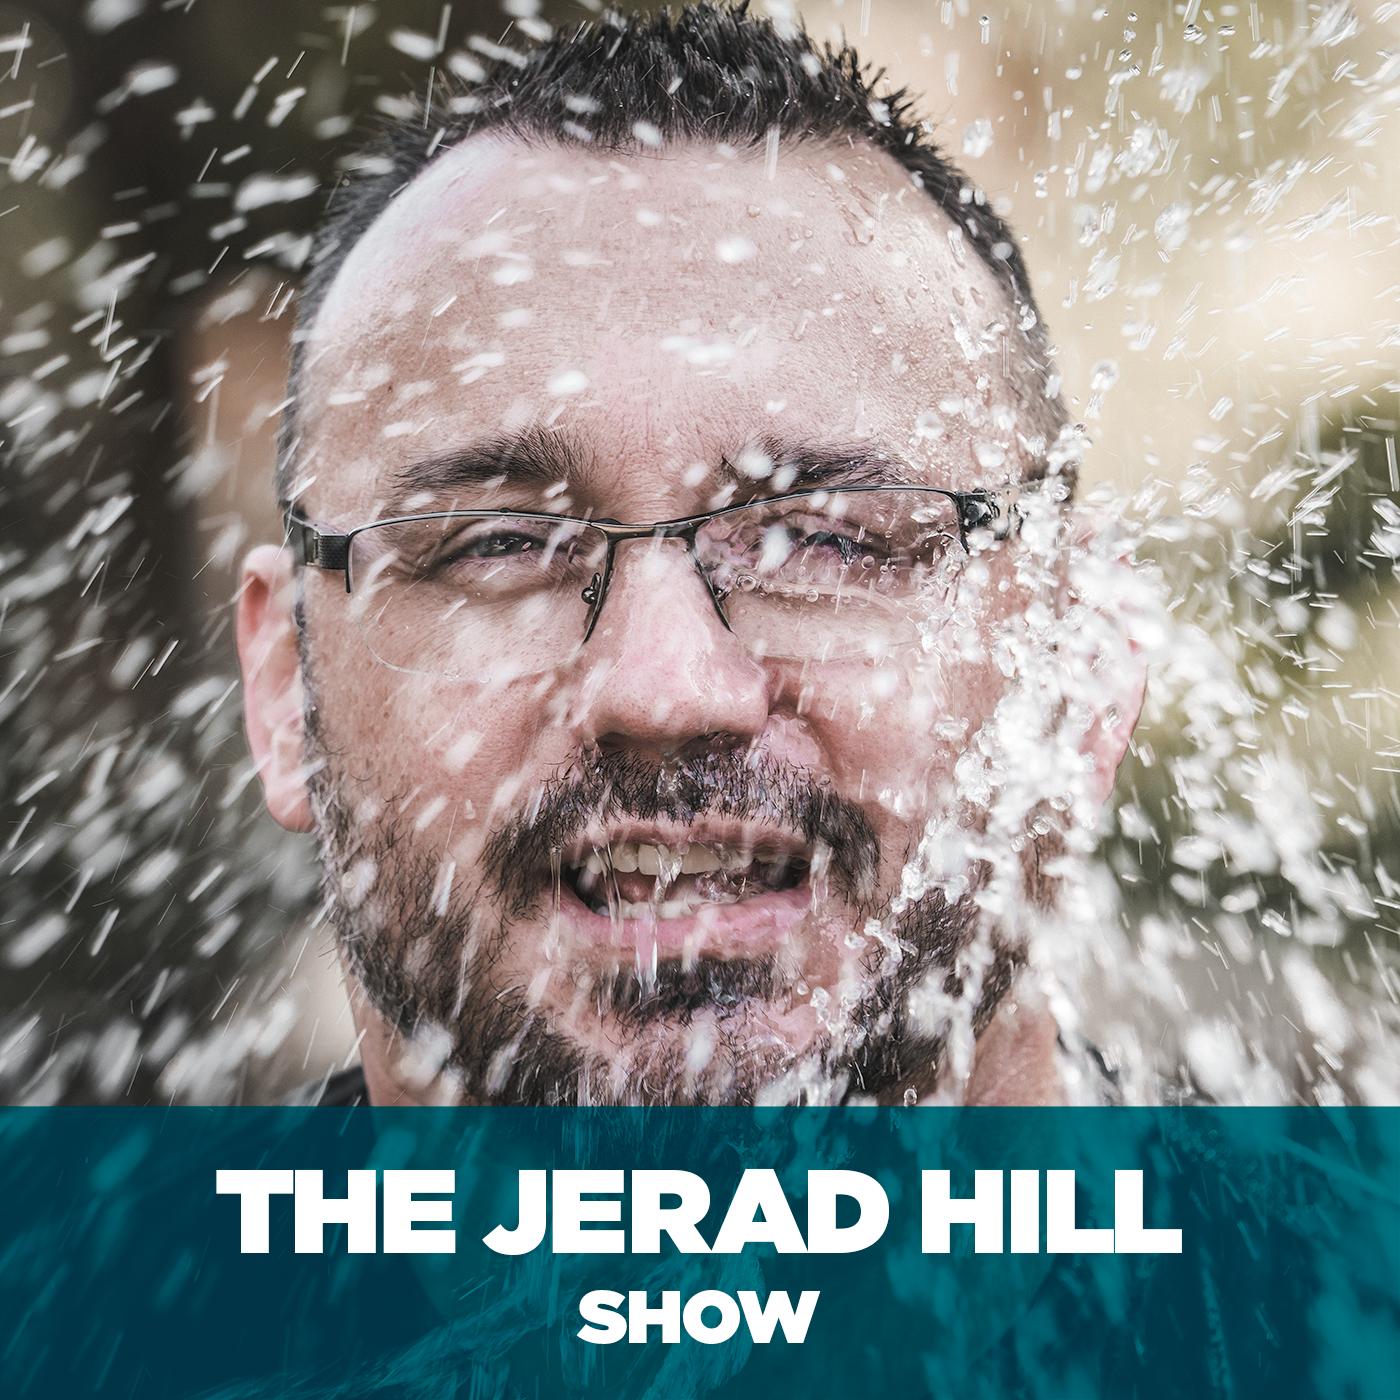 The Jerad Hill Show